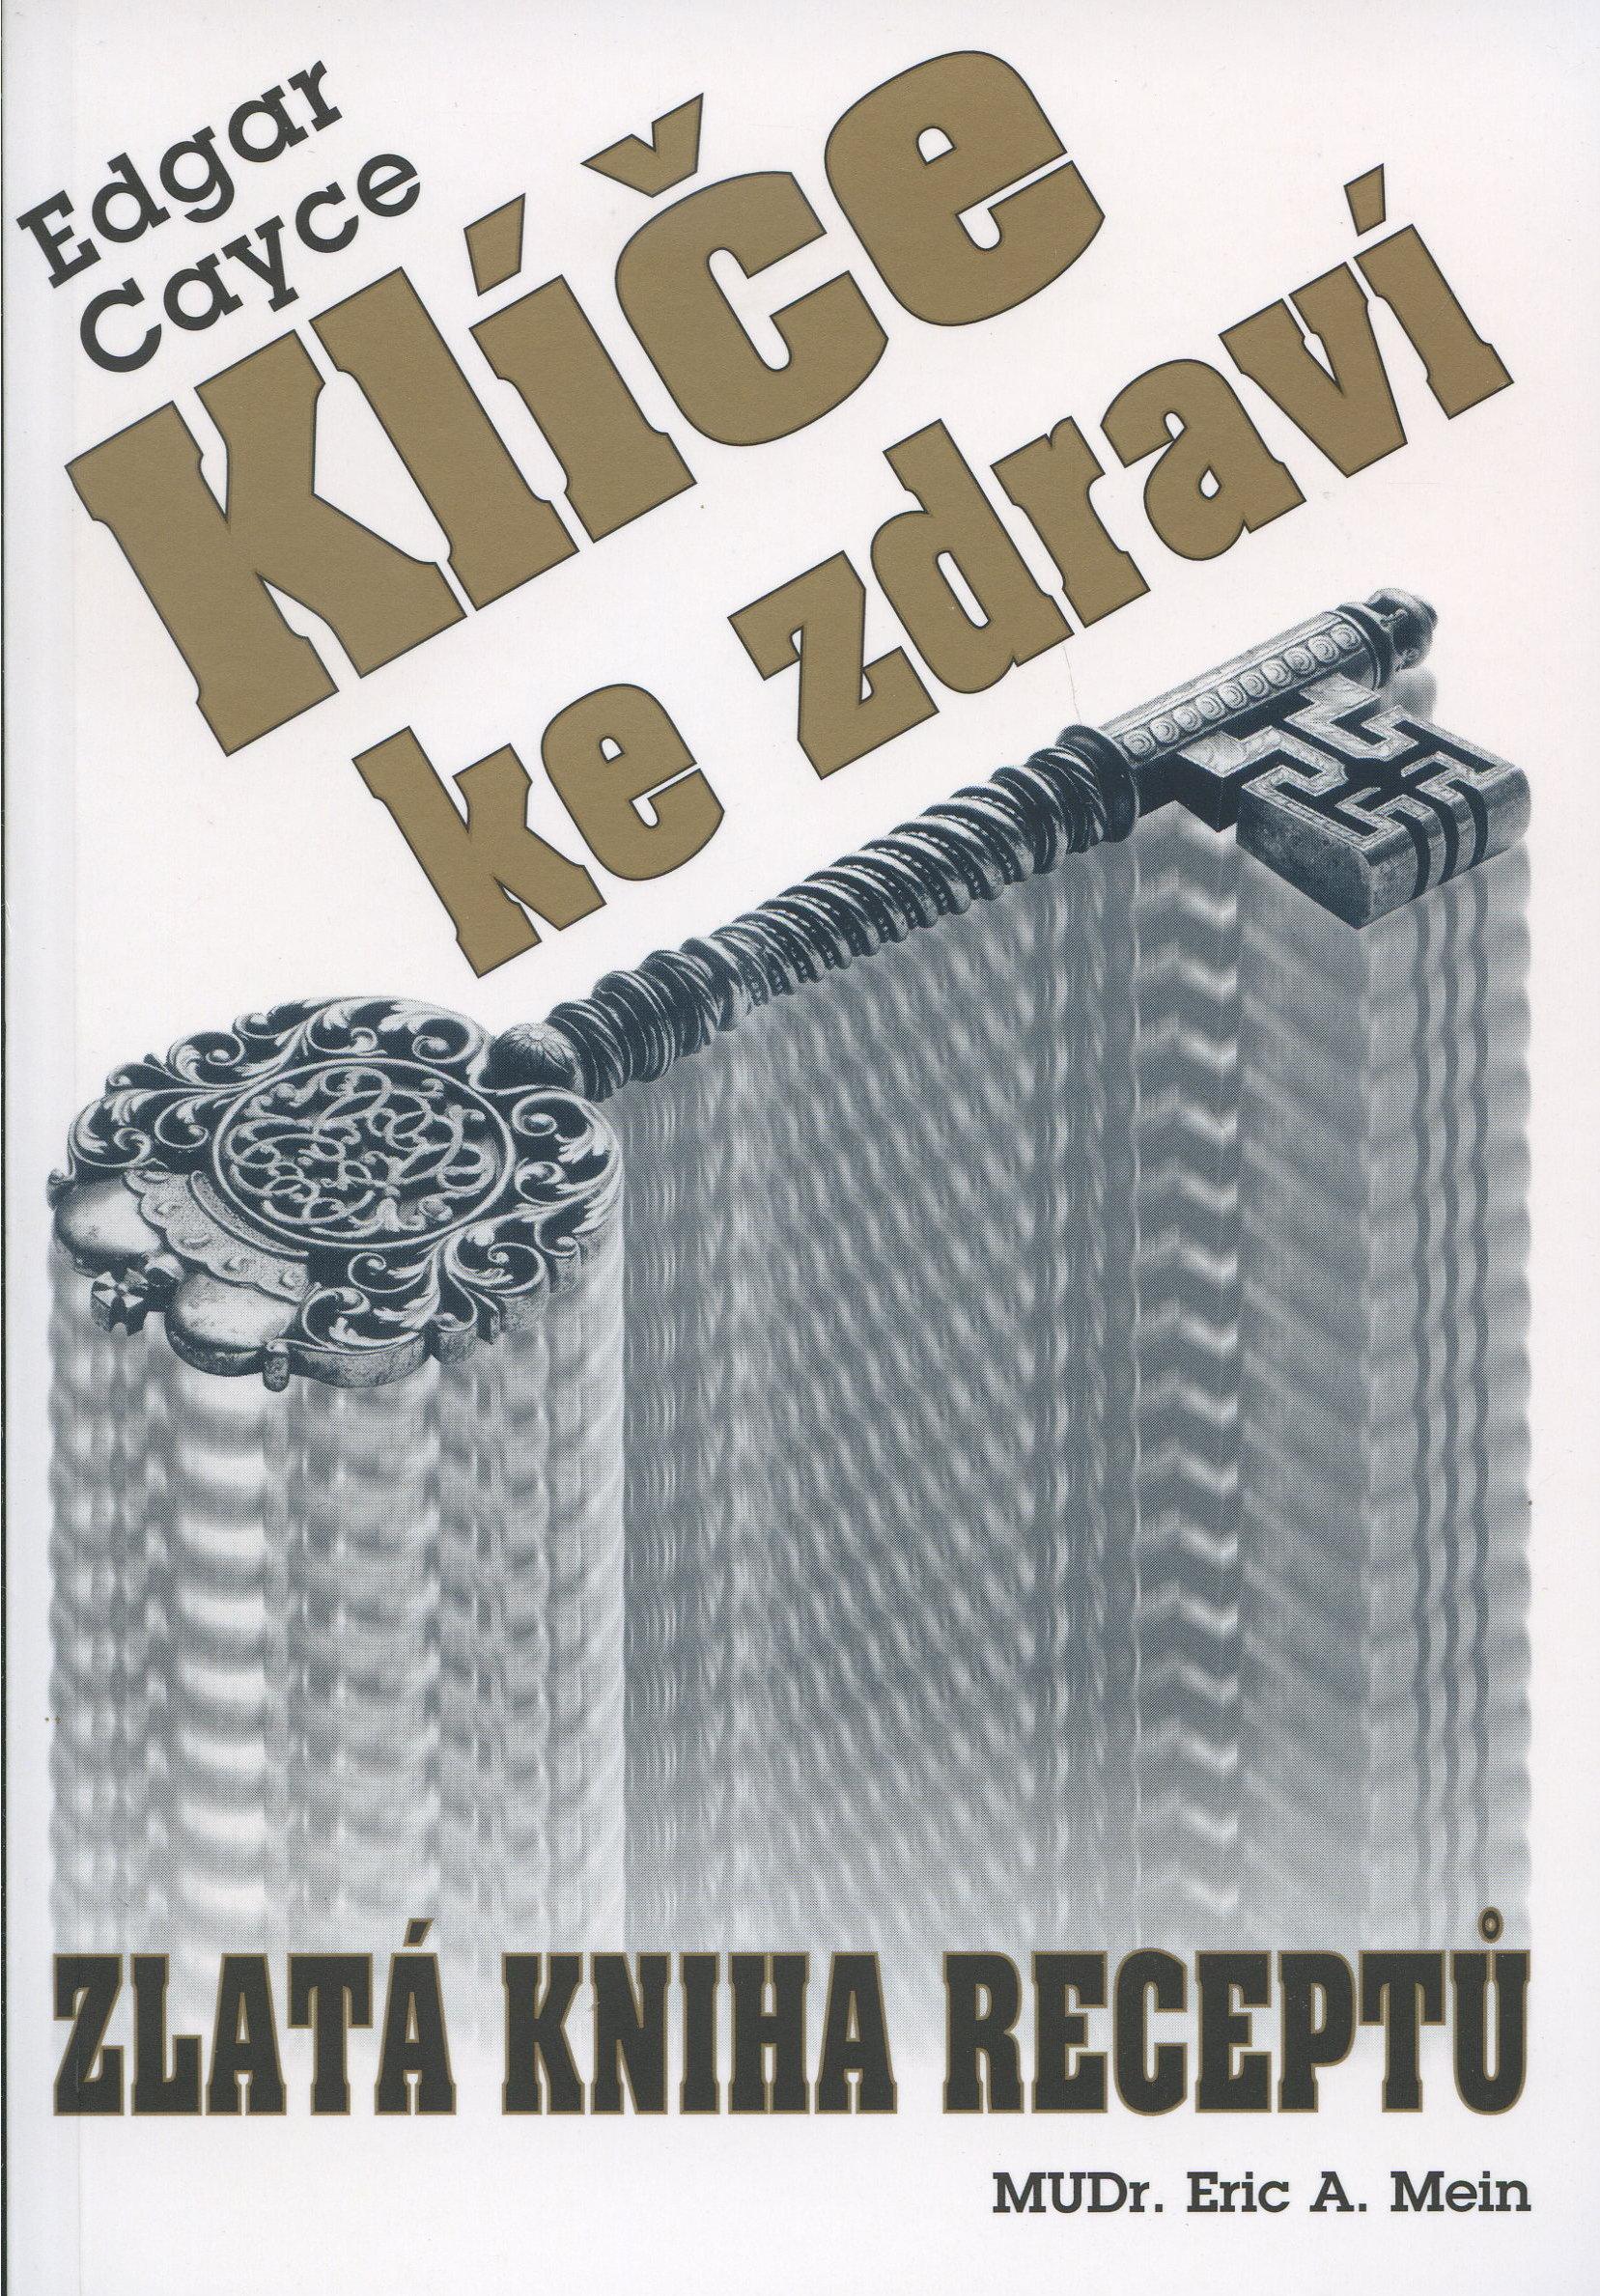 Klíče ke zdraví - zlatá kniha receptů / Edgar Cayce